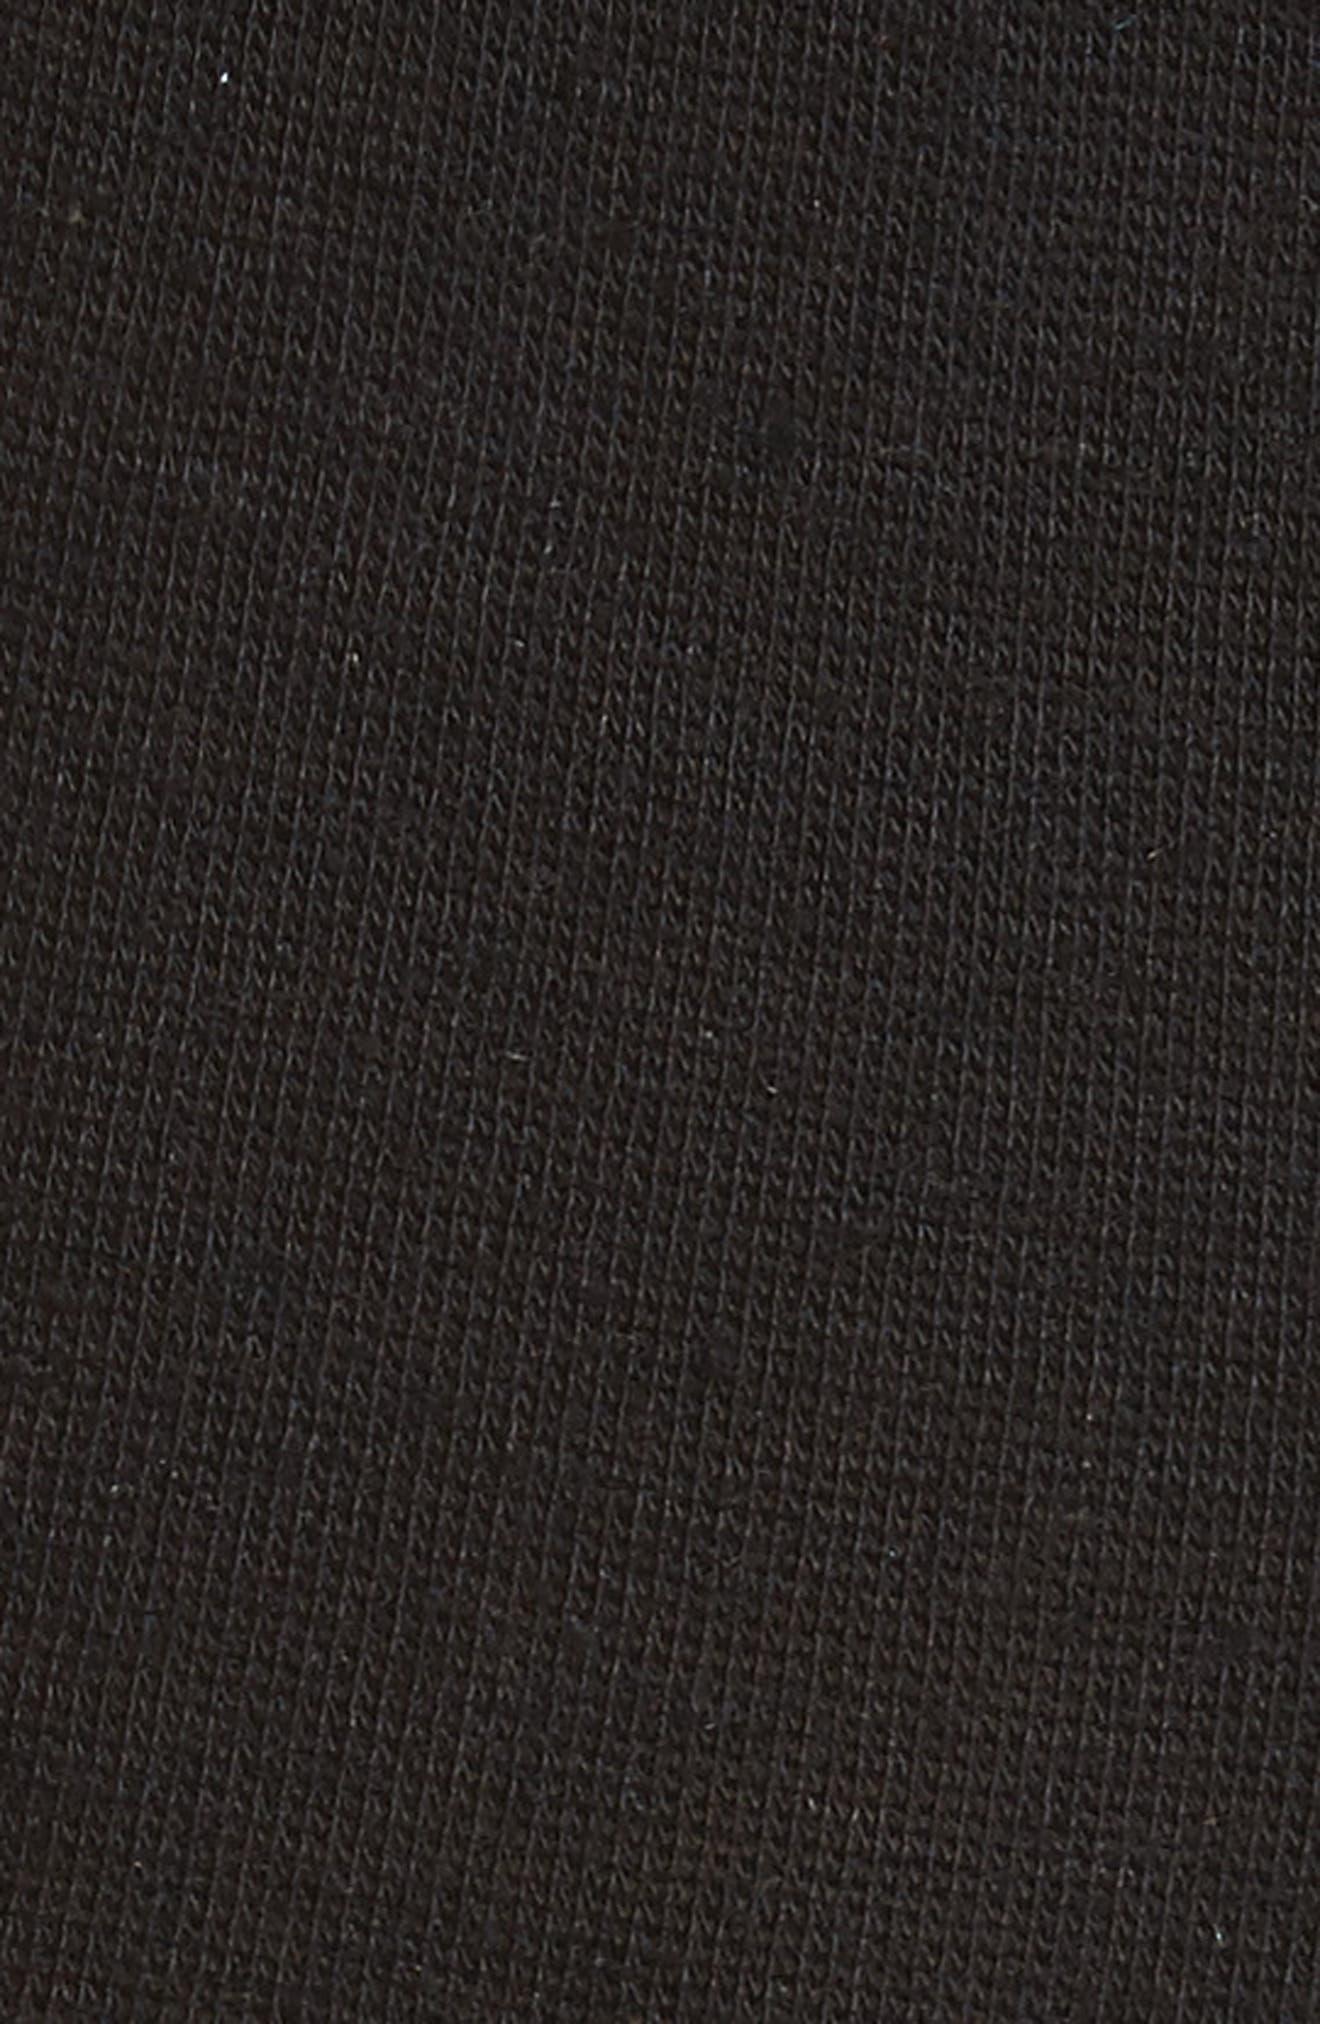 Mariposa Lace Top,                             Alternate thumbnail 5, color,                             001